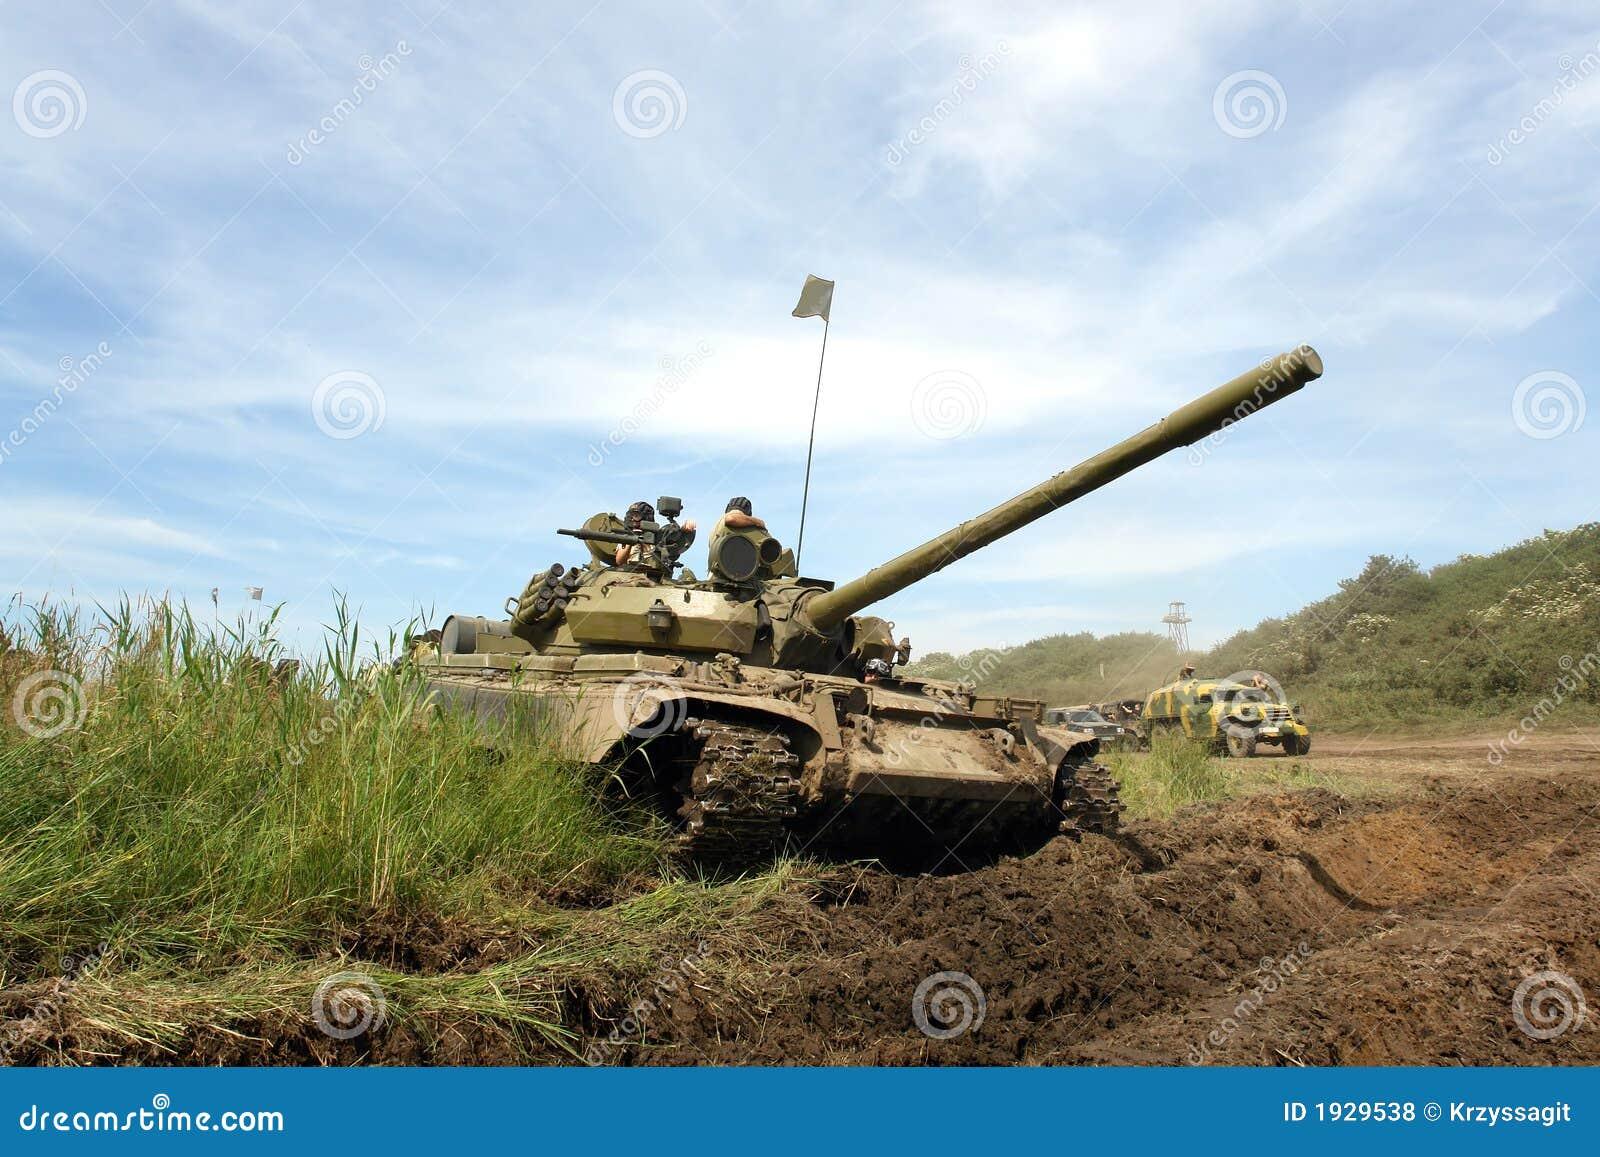 Military vehicle, old tank, WW